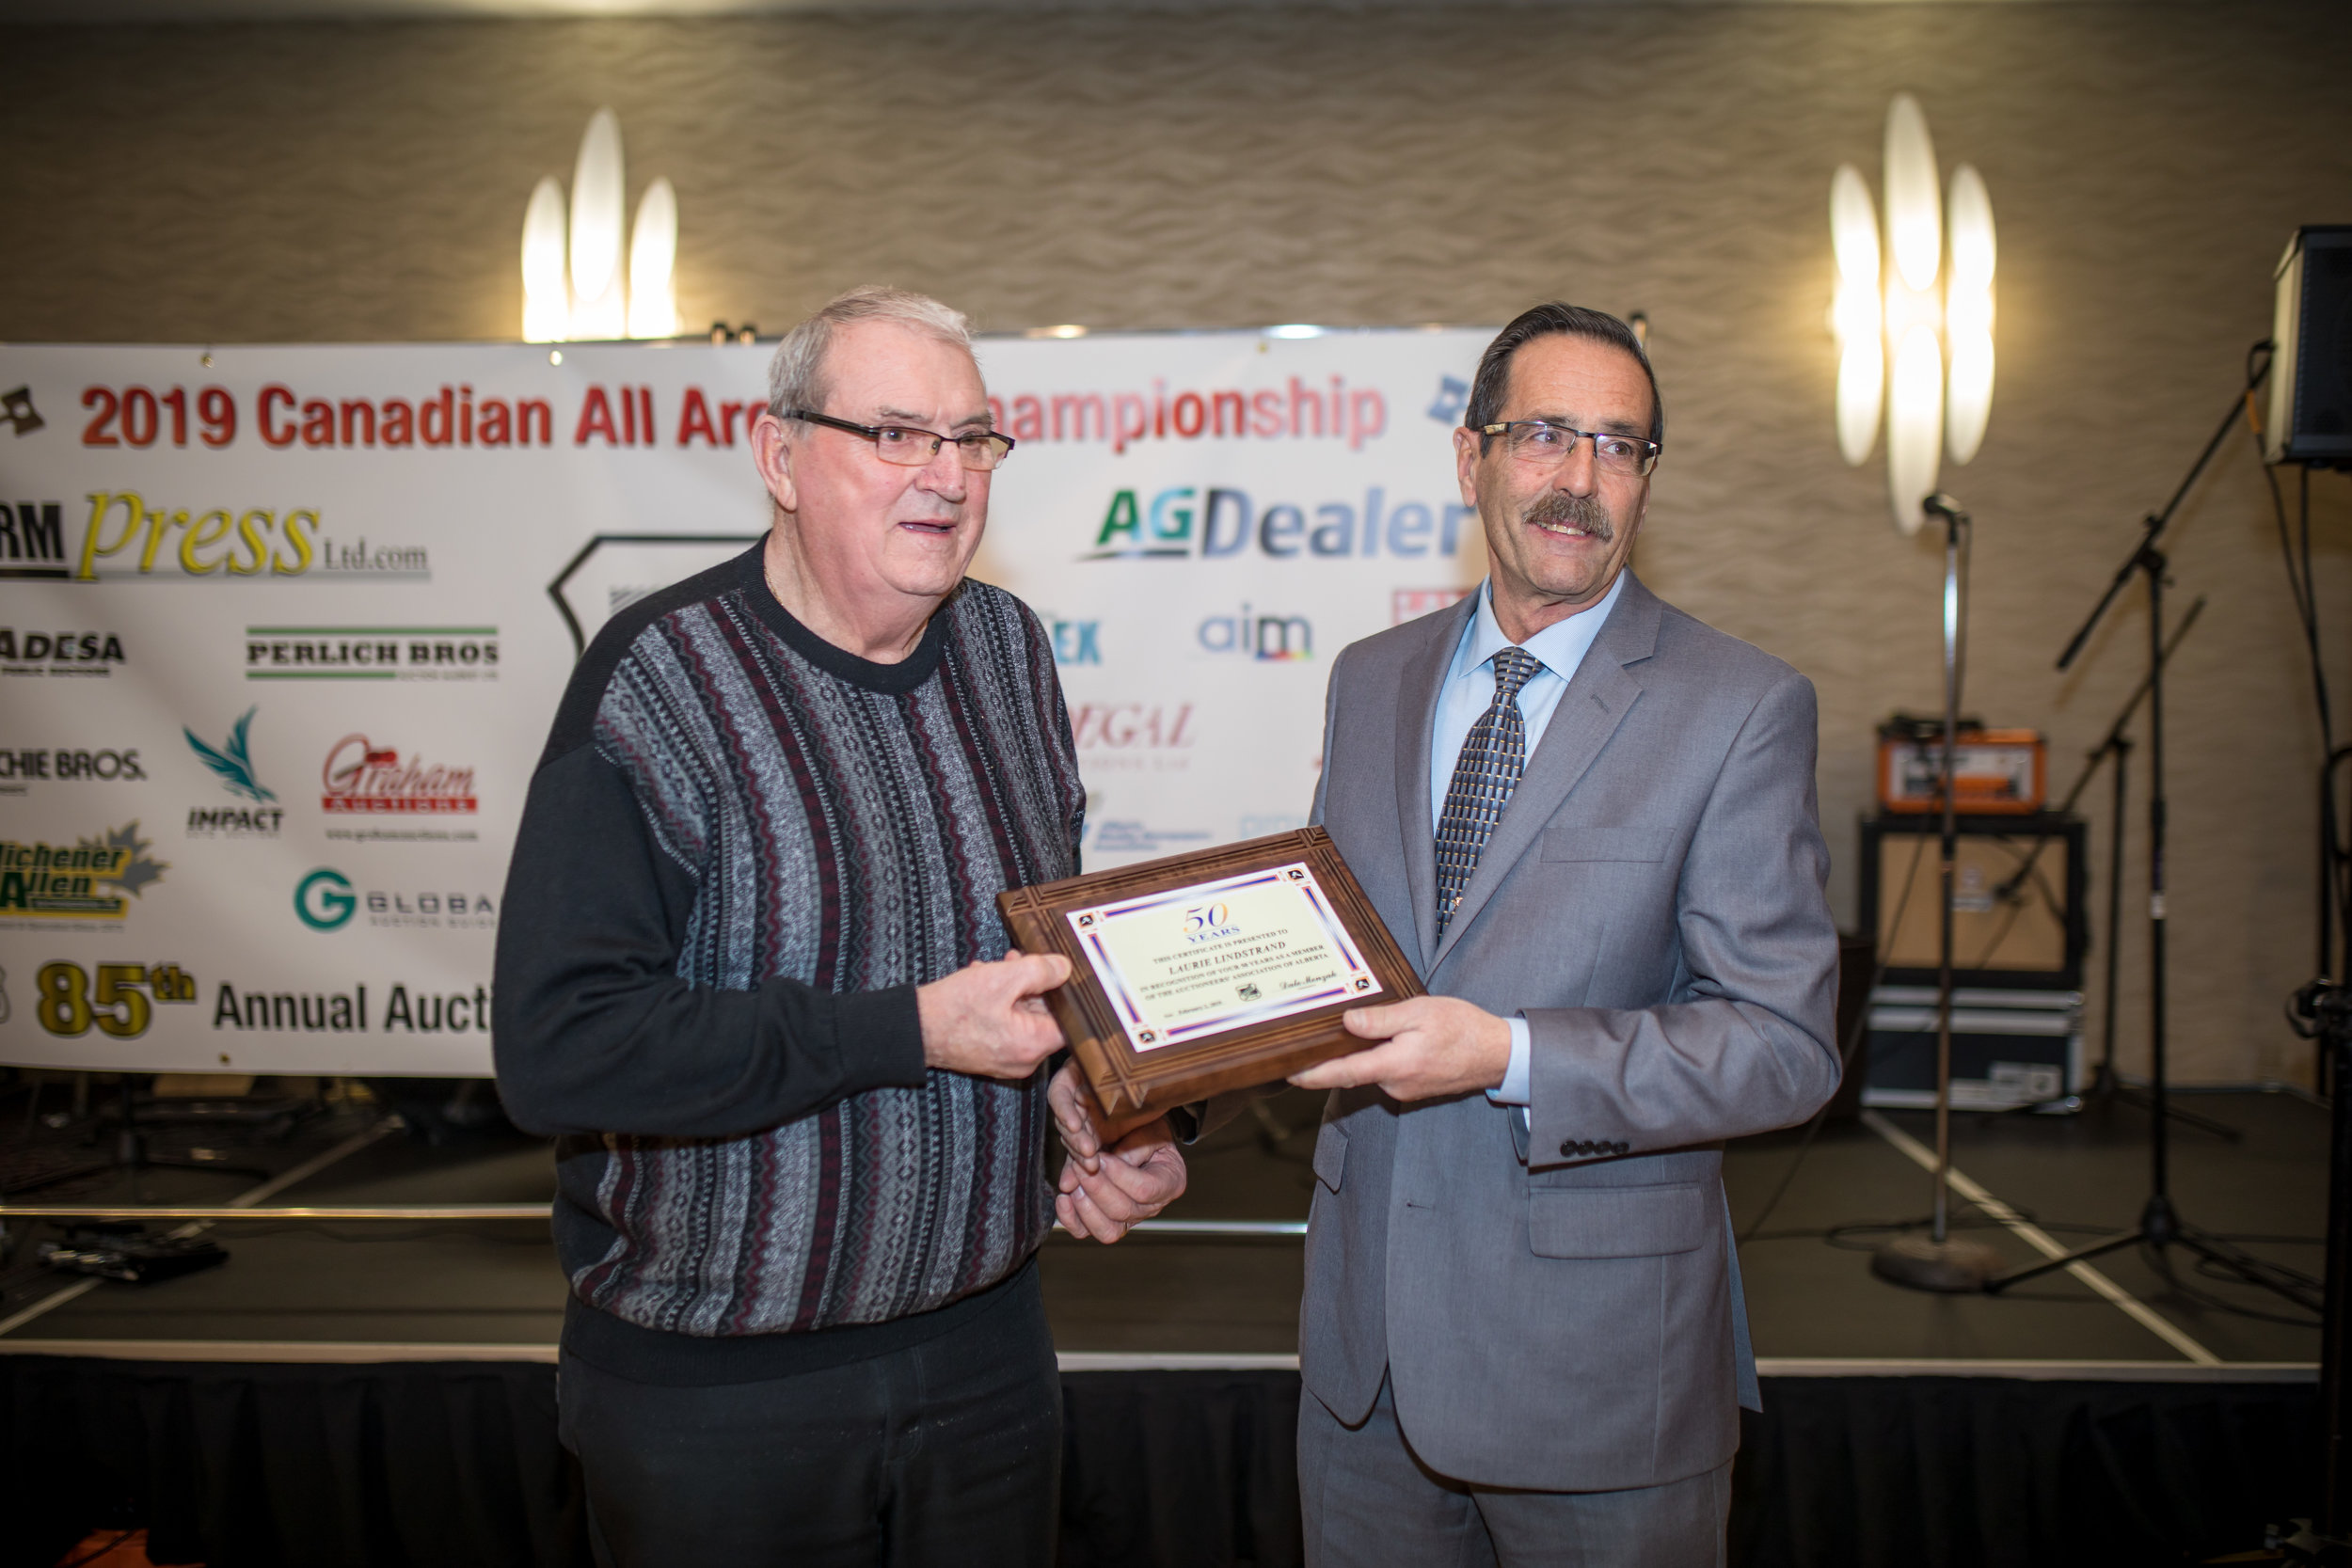 2019 02-02 Alberta Auctioneer Convention Day 03 - Calgary 19.jpg